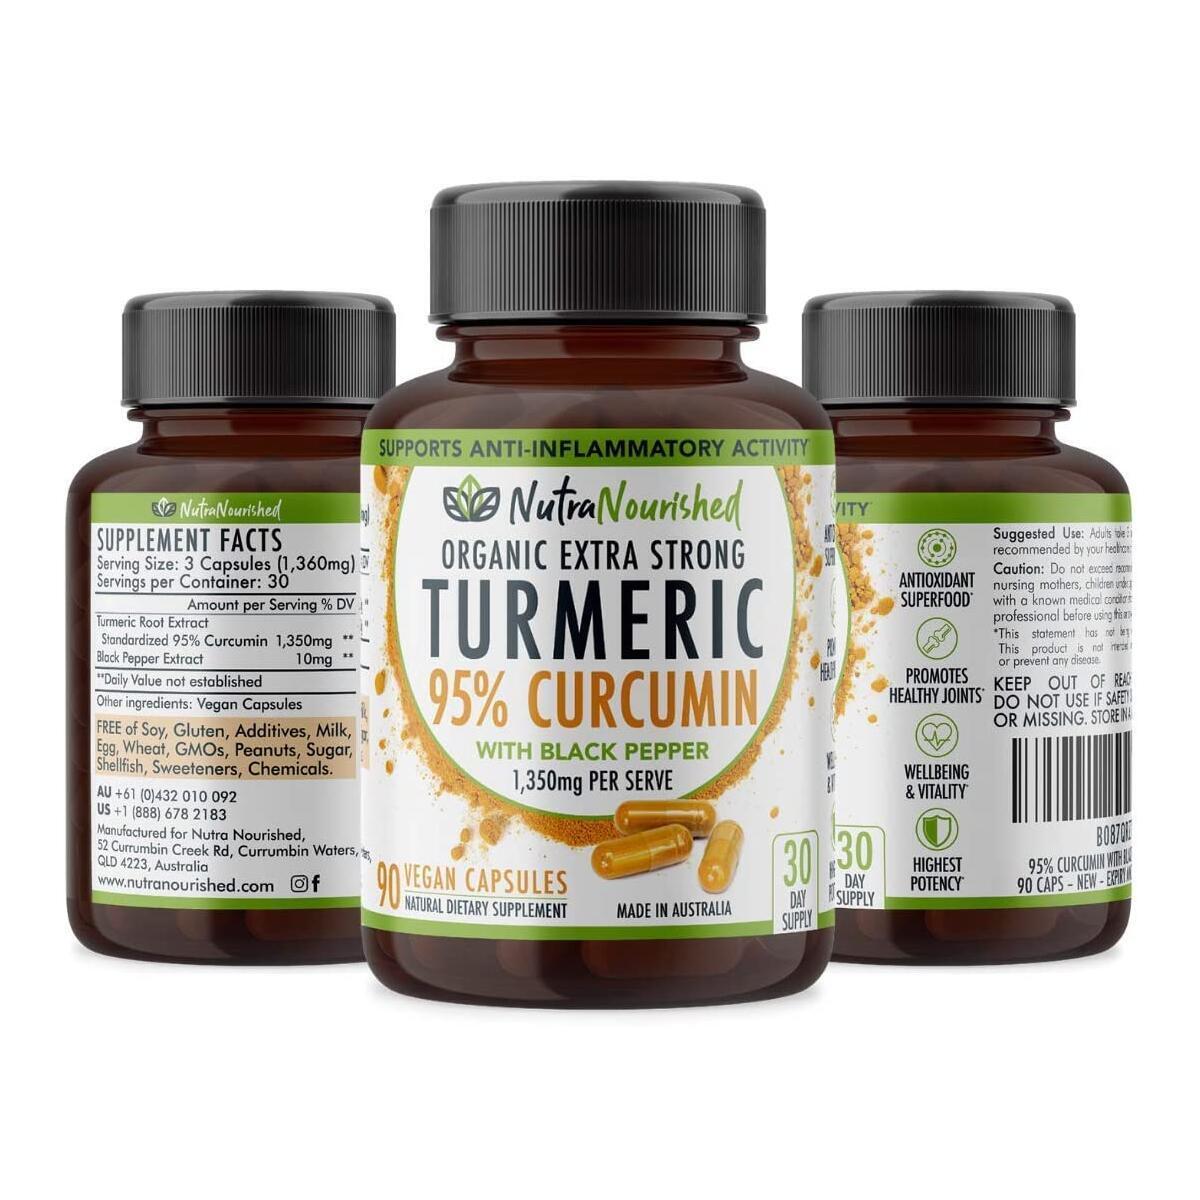 Turmeric 95% Curcumin Capsules with Black Pepper (1,350mg), Premium Arthritis Pain & Joint Supplement for Women & Men, 95% Standardised Curcumin Capsules